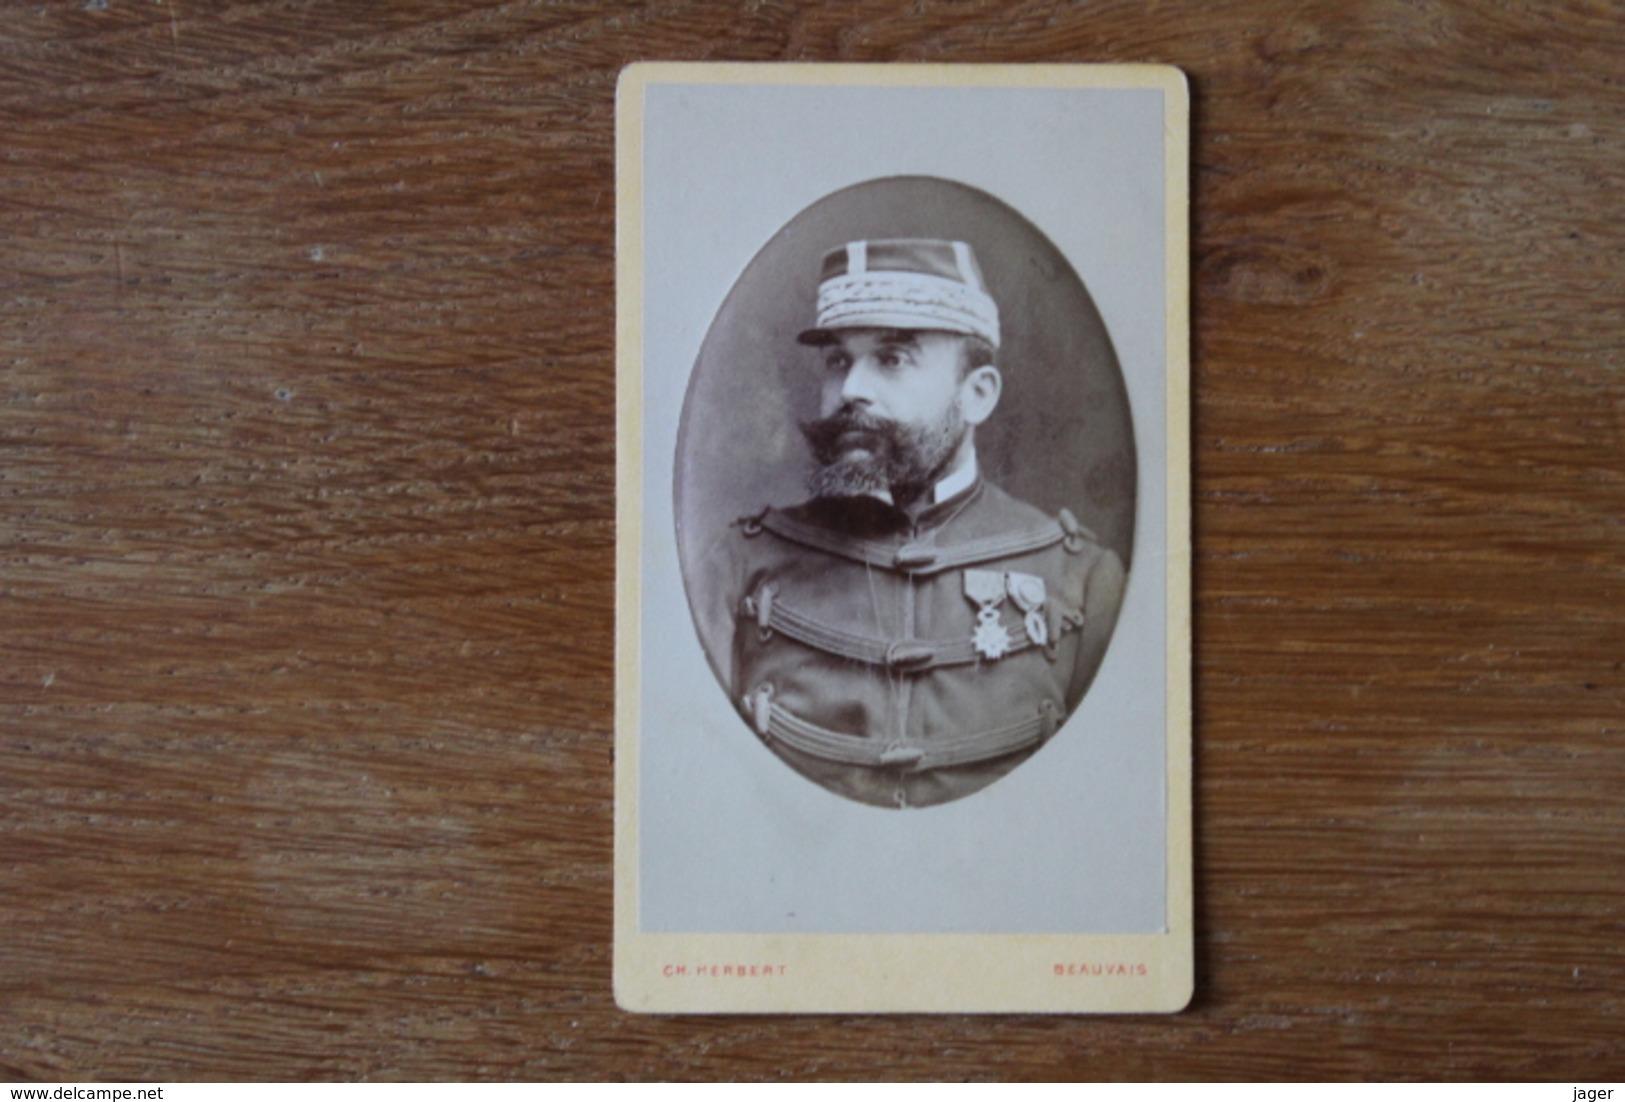 Cdv Le Generla De Pradelle Vers 1880 Kepi Brodé Par  Herbert Beauvais - Guerra, Militares